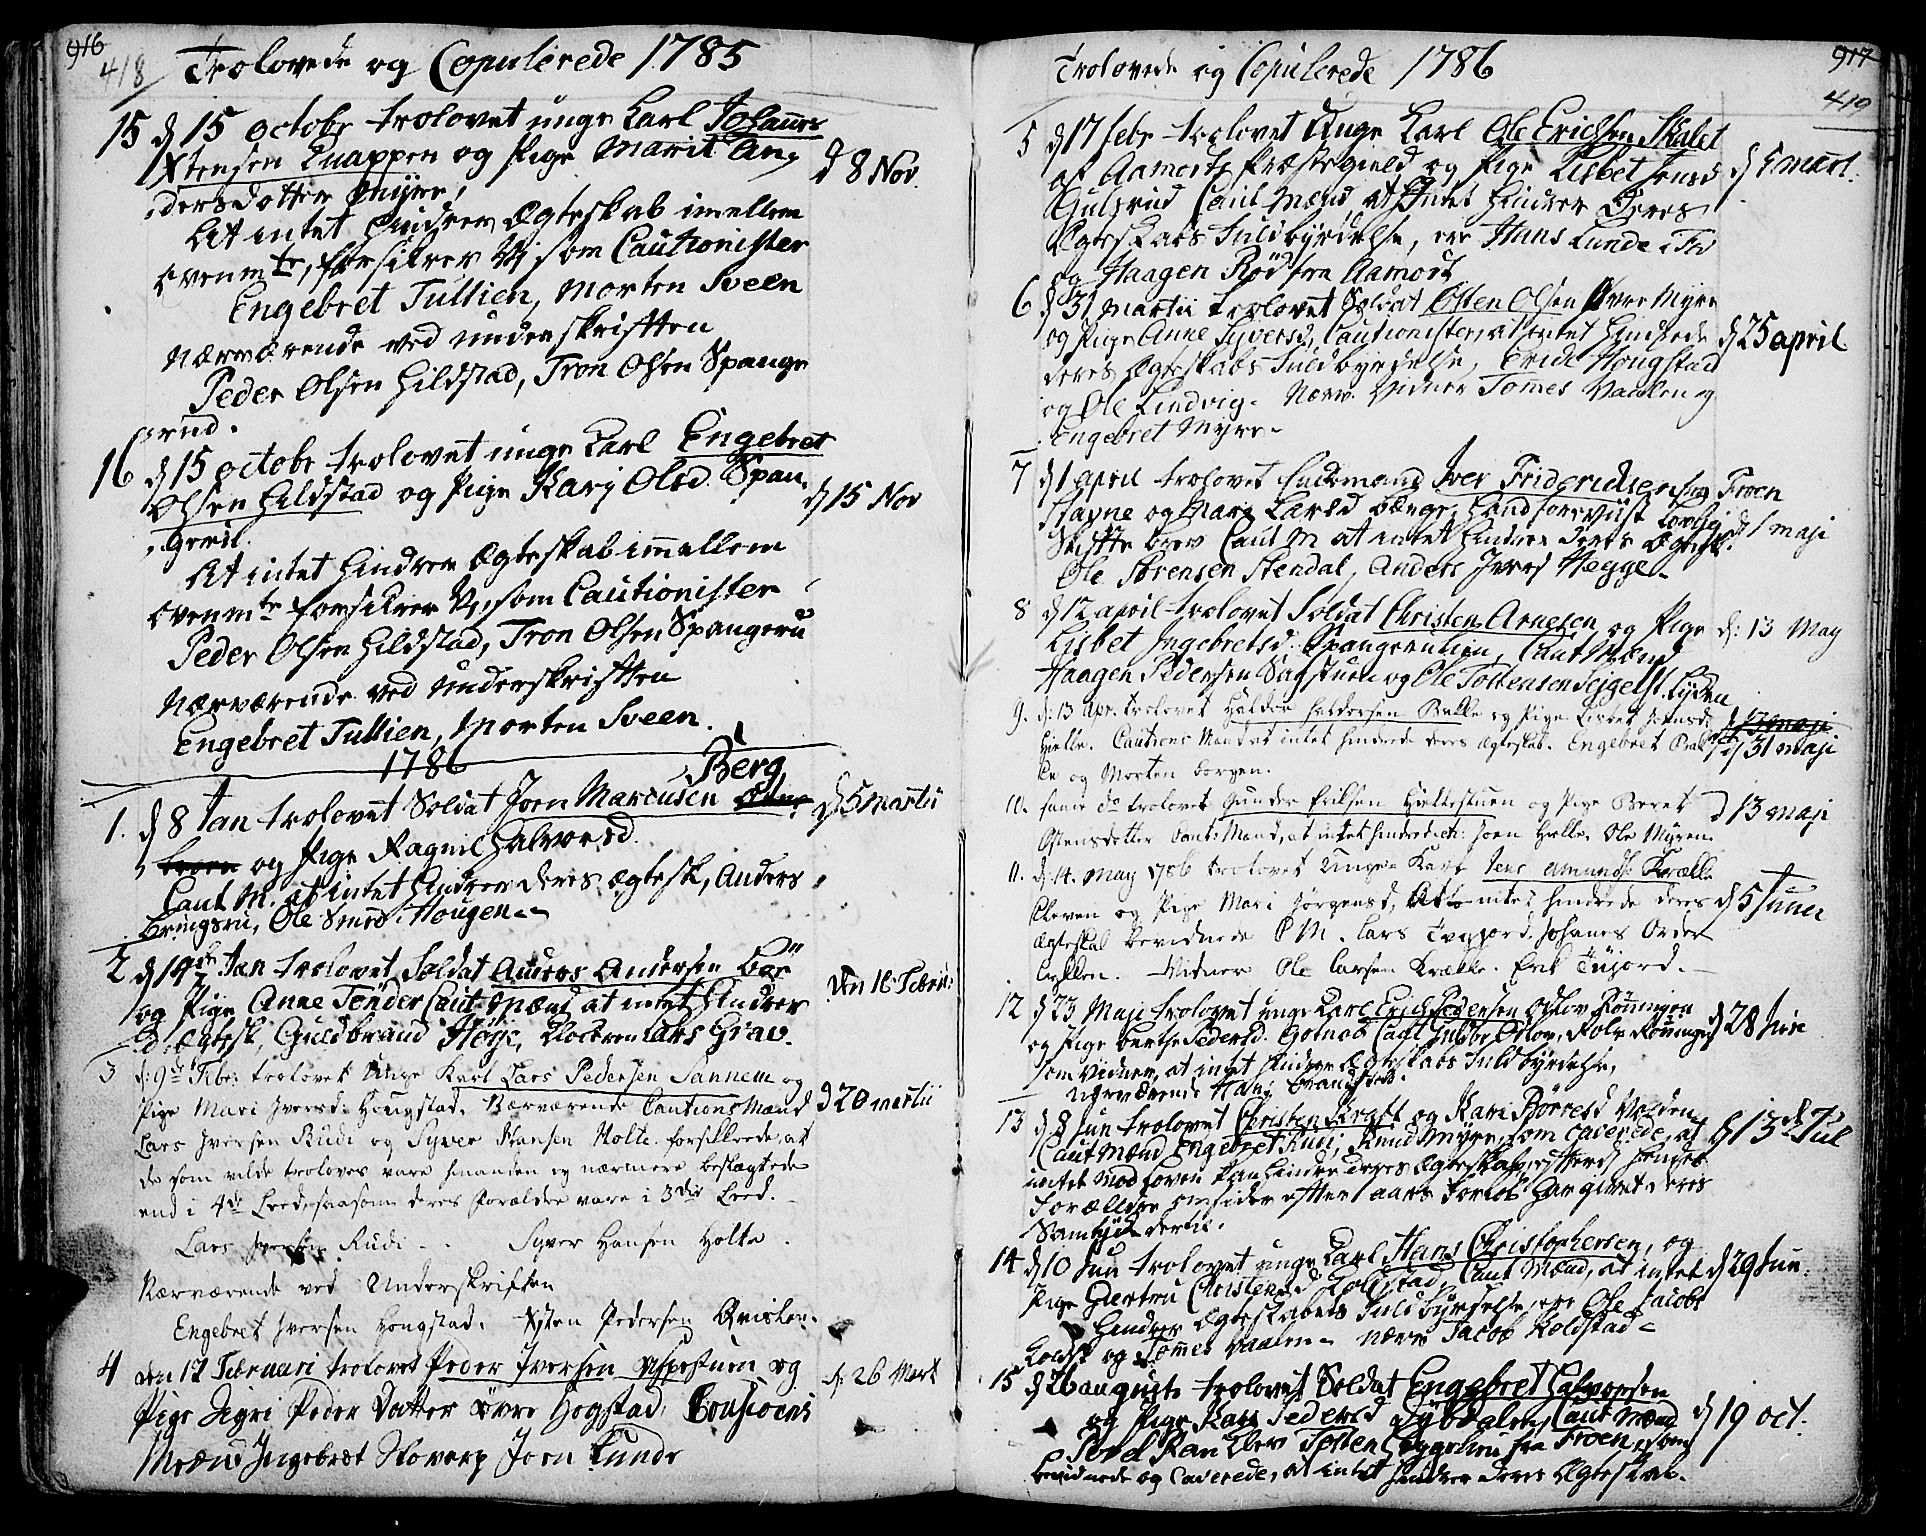 SAH, Ringebu prestekontor, Ministerialbok nr. 3, 1781-1820, s. 418-419